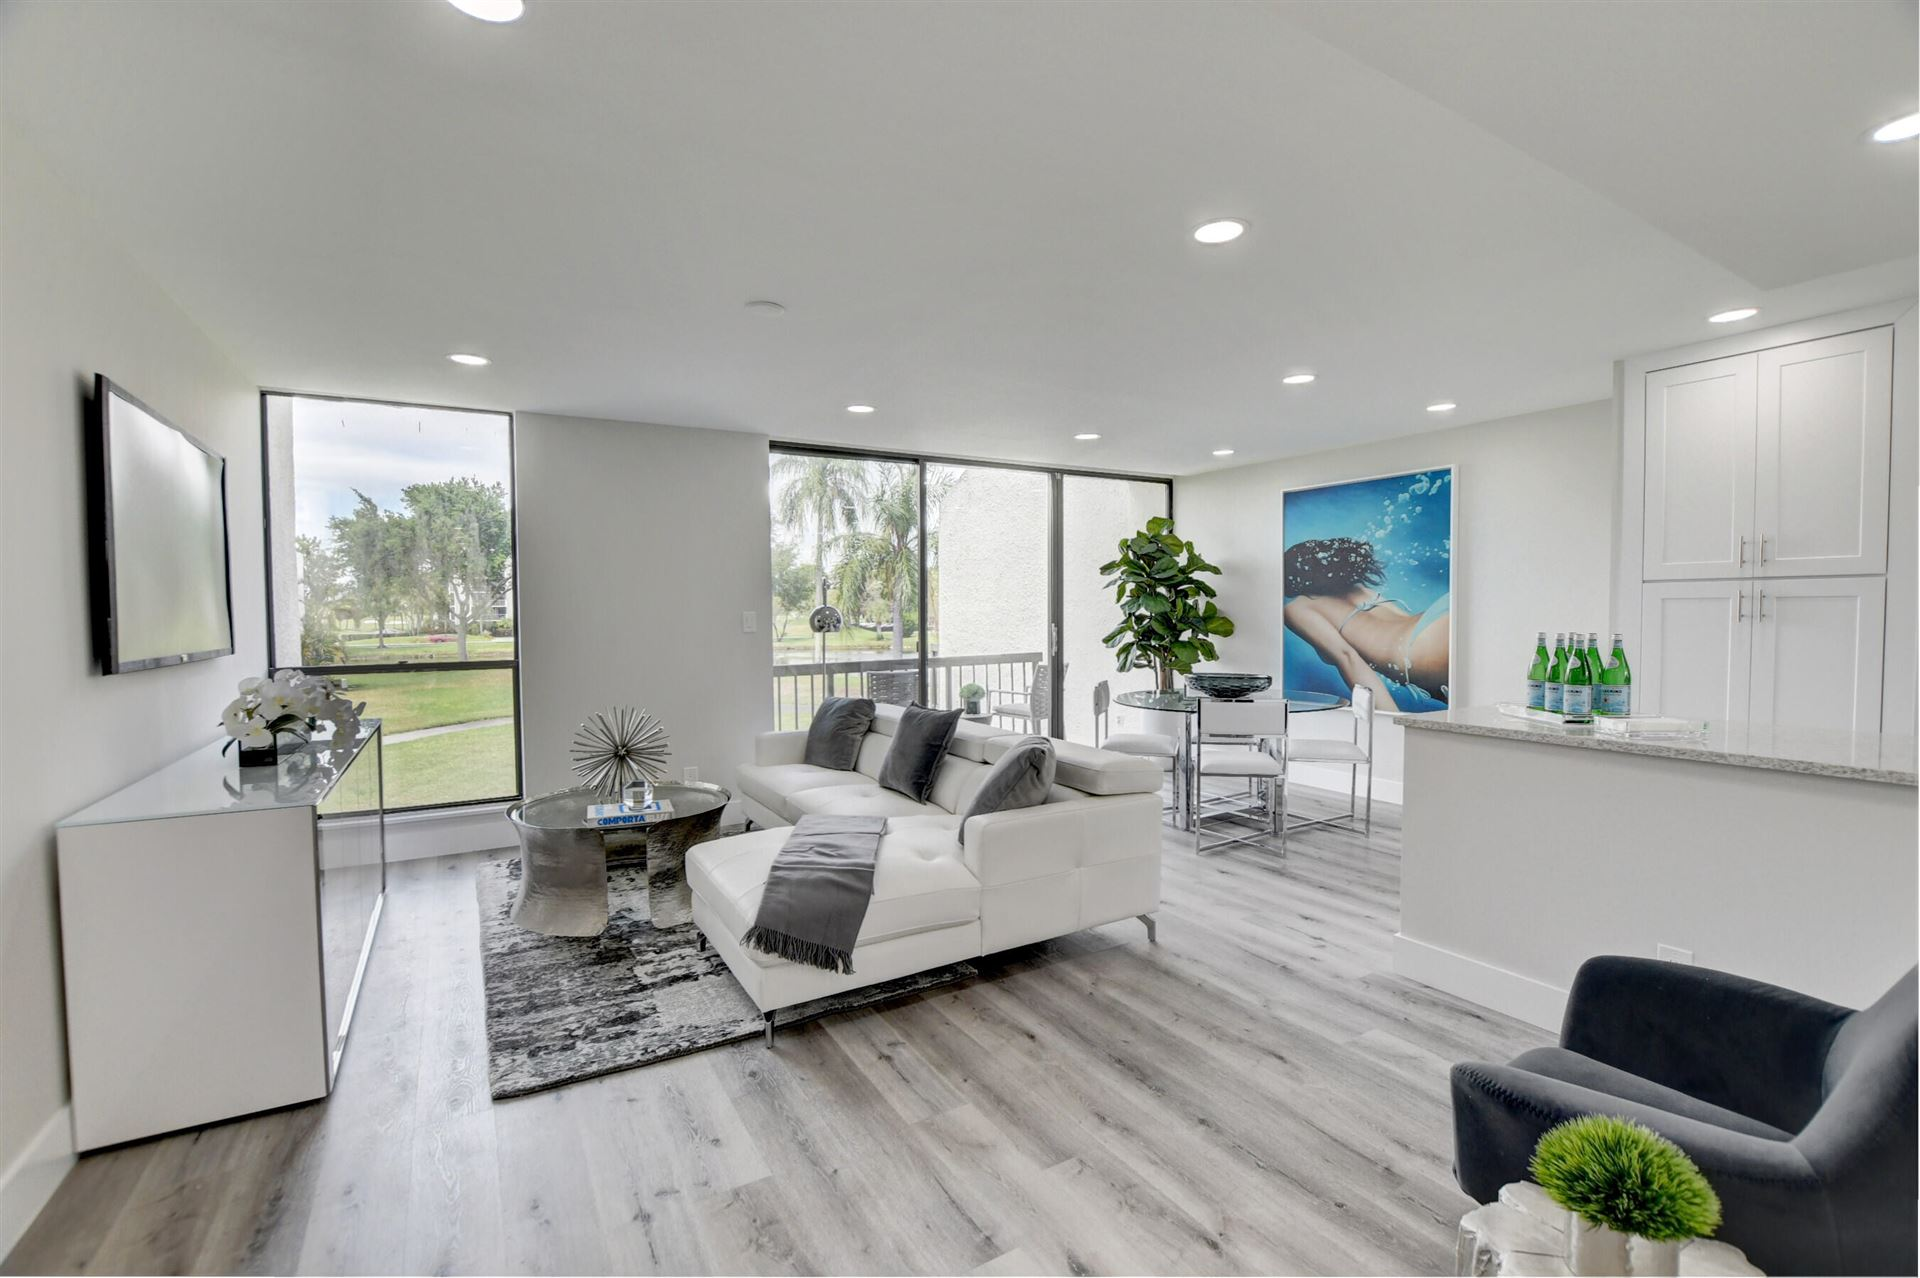 1005 Bridgewood Place, Boca Raton, FL 33434 - #: RX-10673125